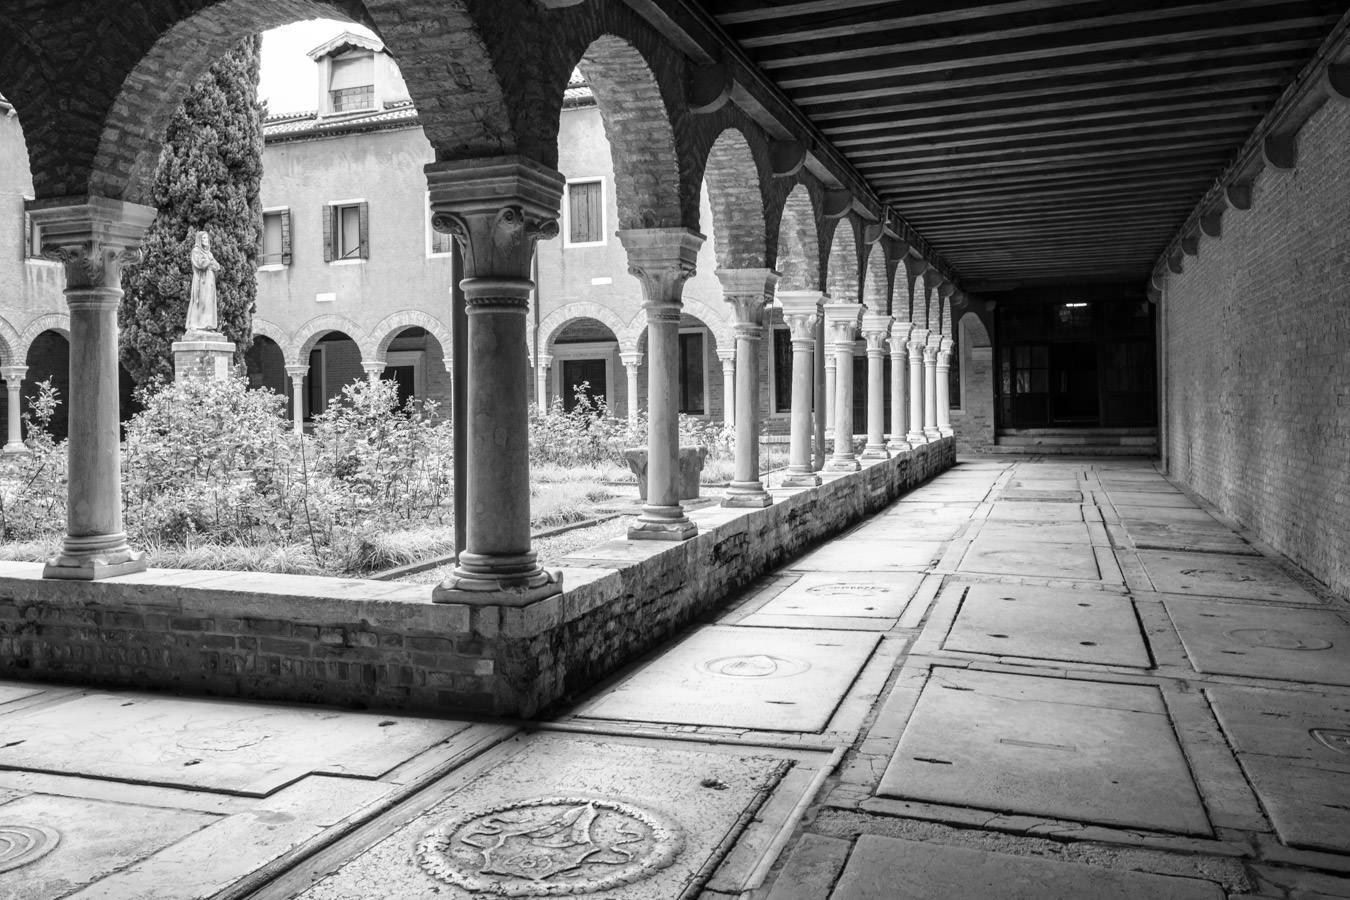 Le-cloître-de-San-Francesto-della-Vigna